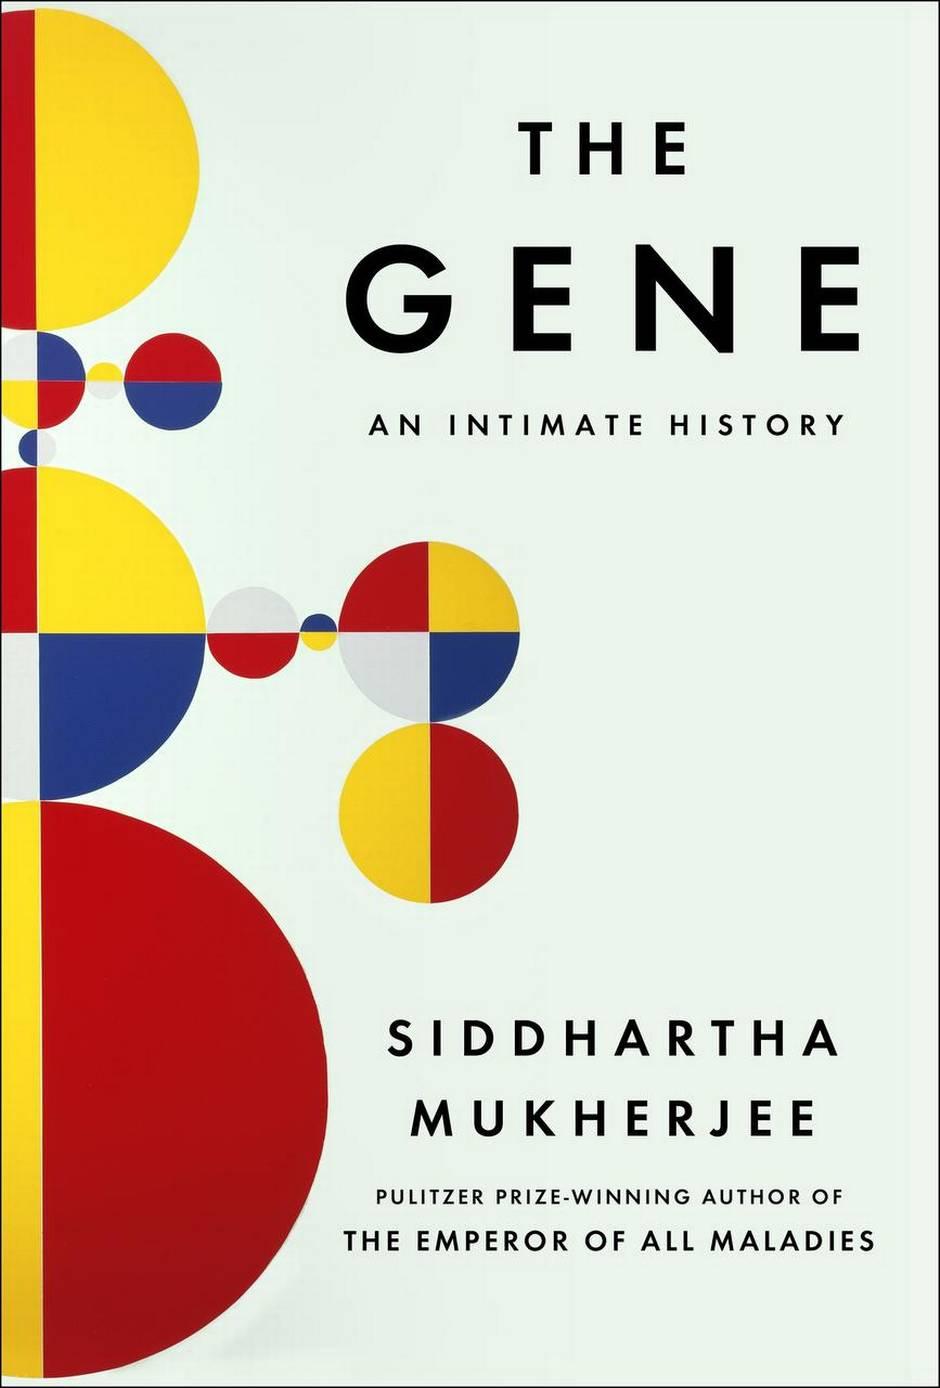 The+Gene+by+Siddhartha+Mukherjee